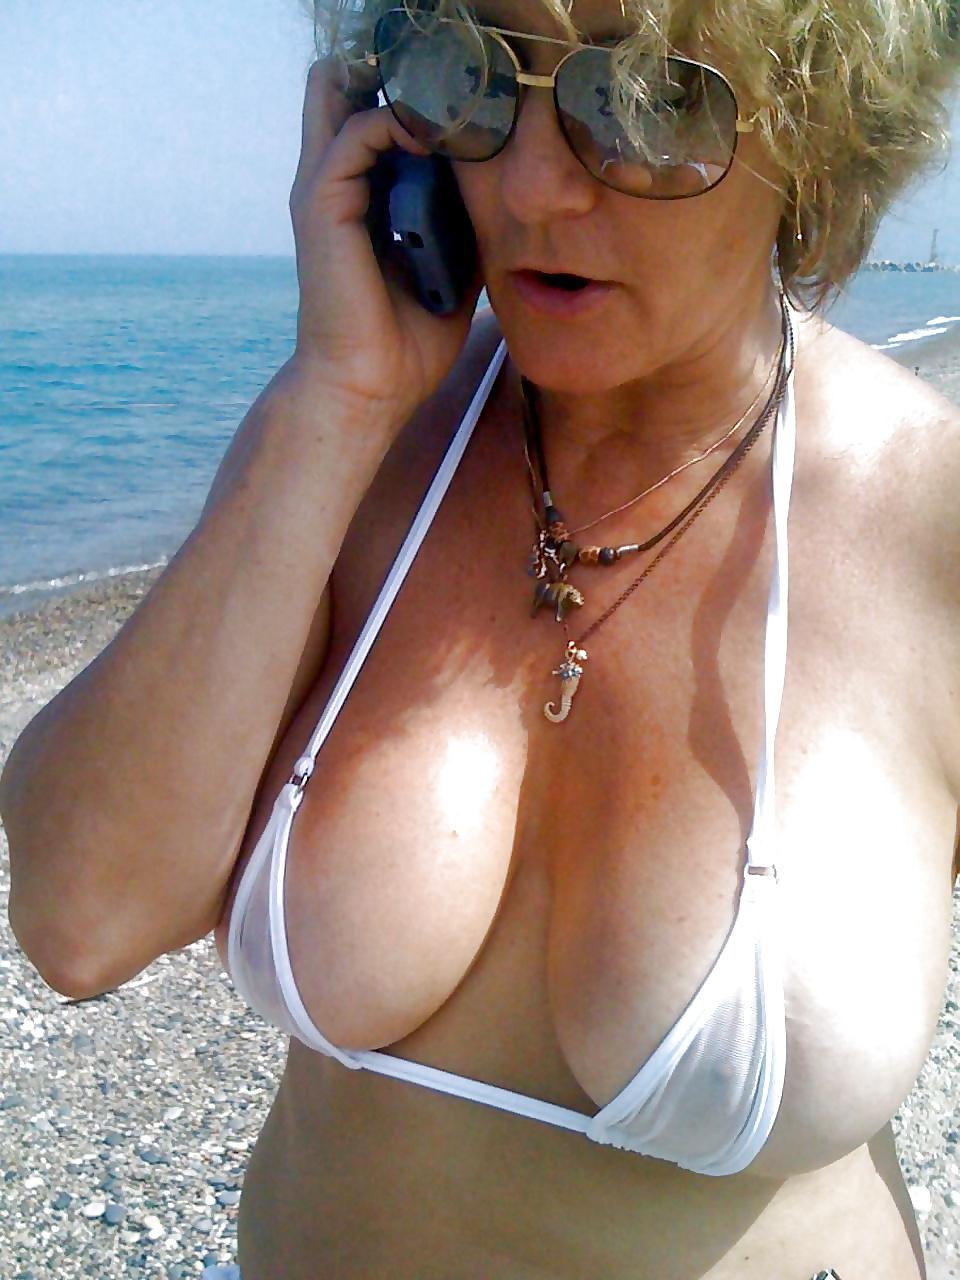 Hot granny tits bikini